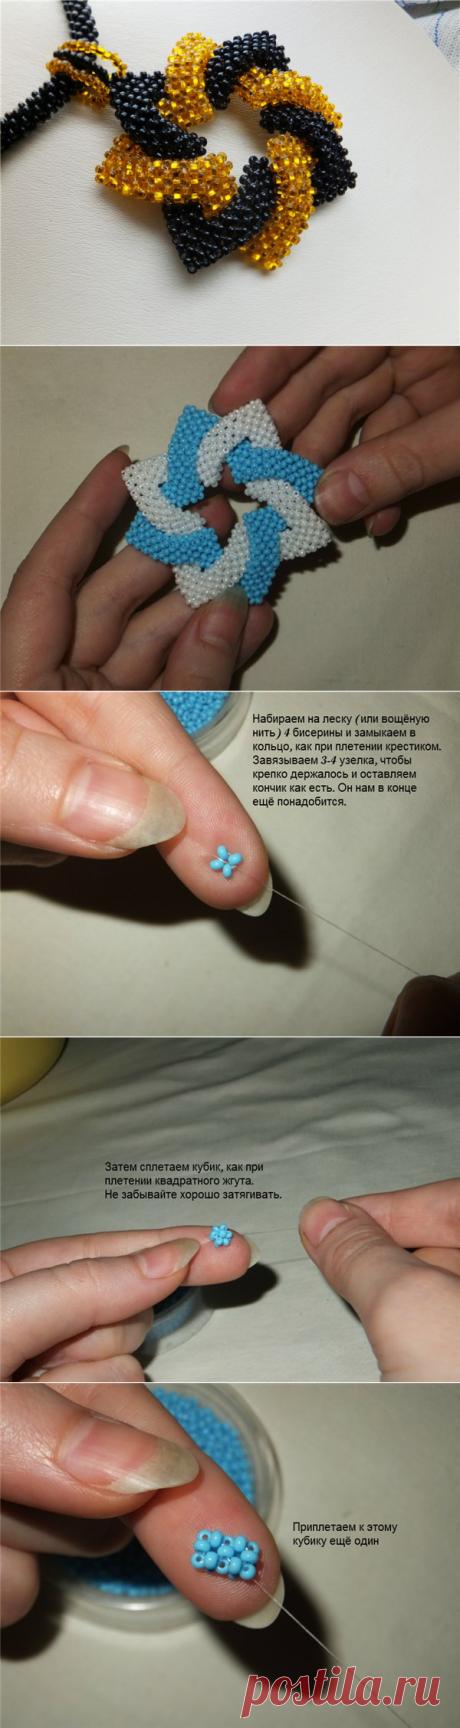 1/Геометрическия загогулина - кулон из бисера. МК.